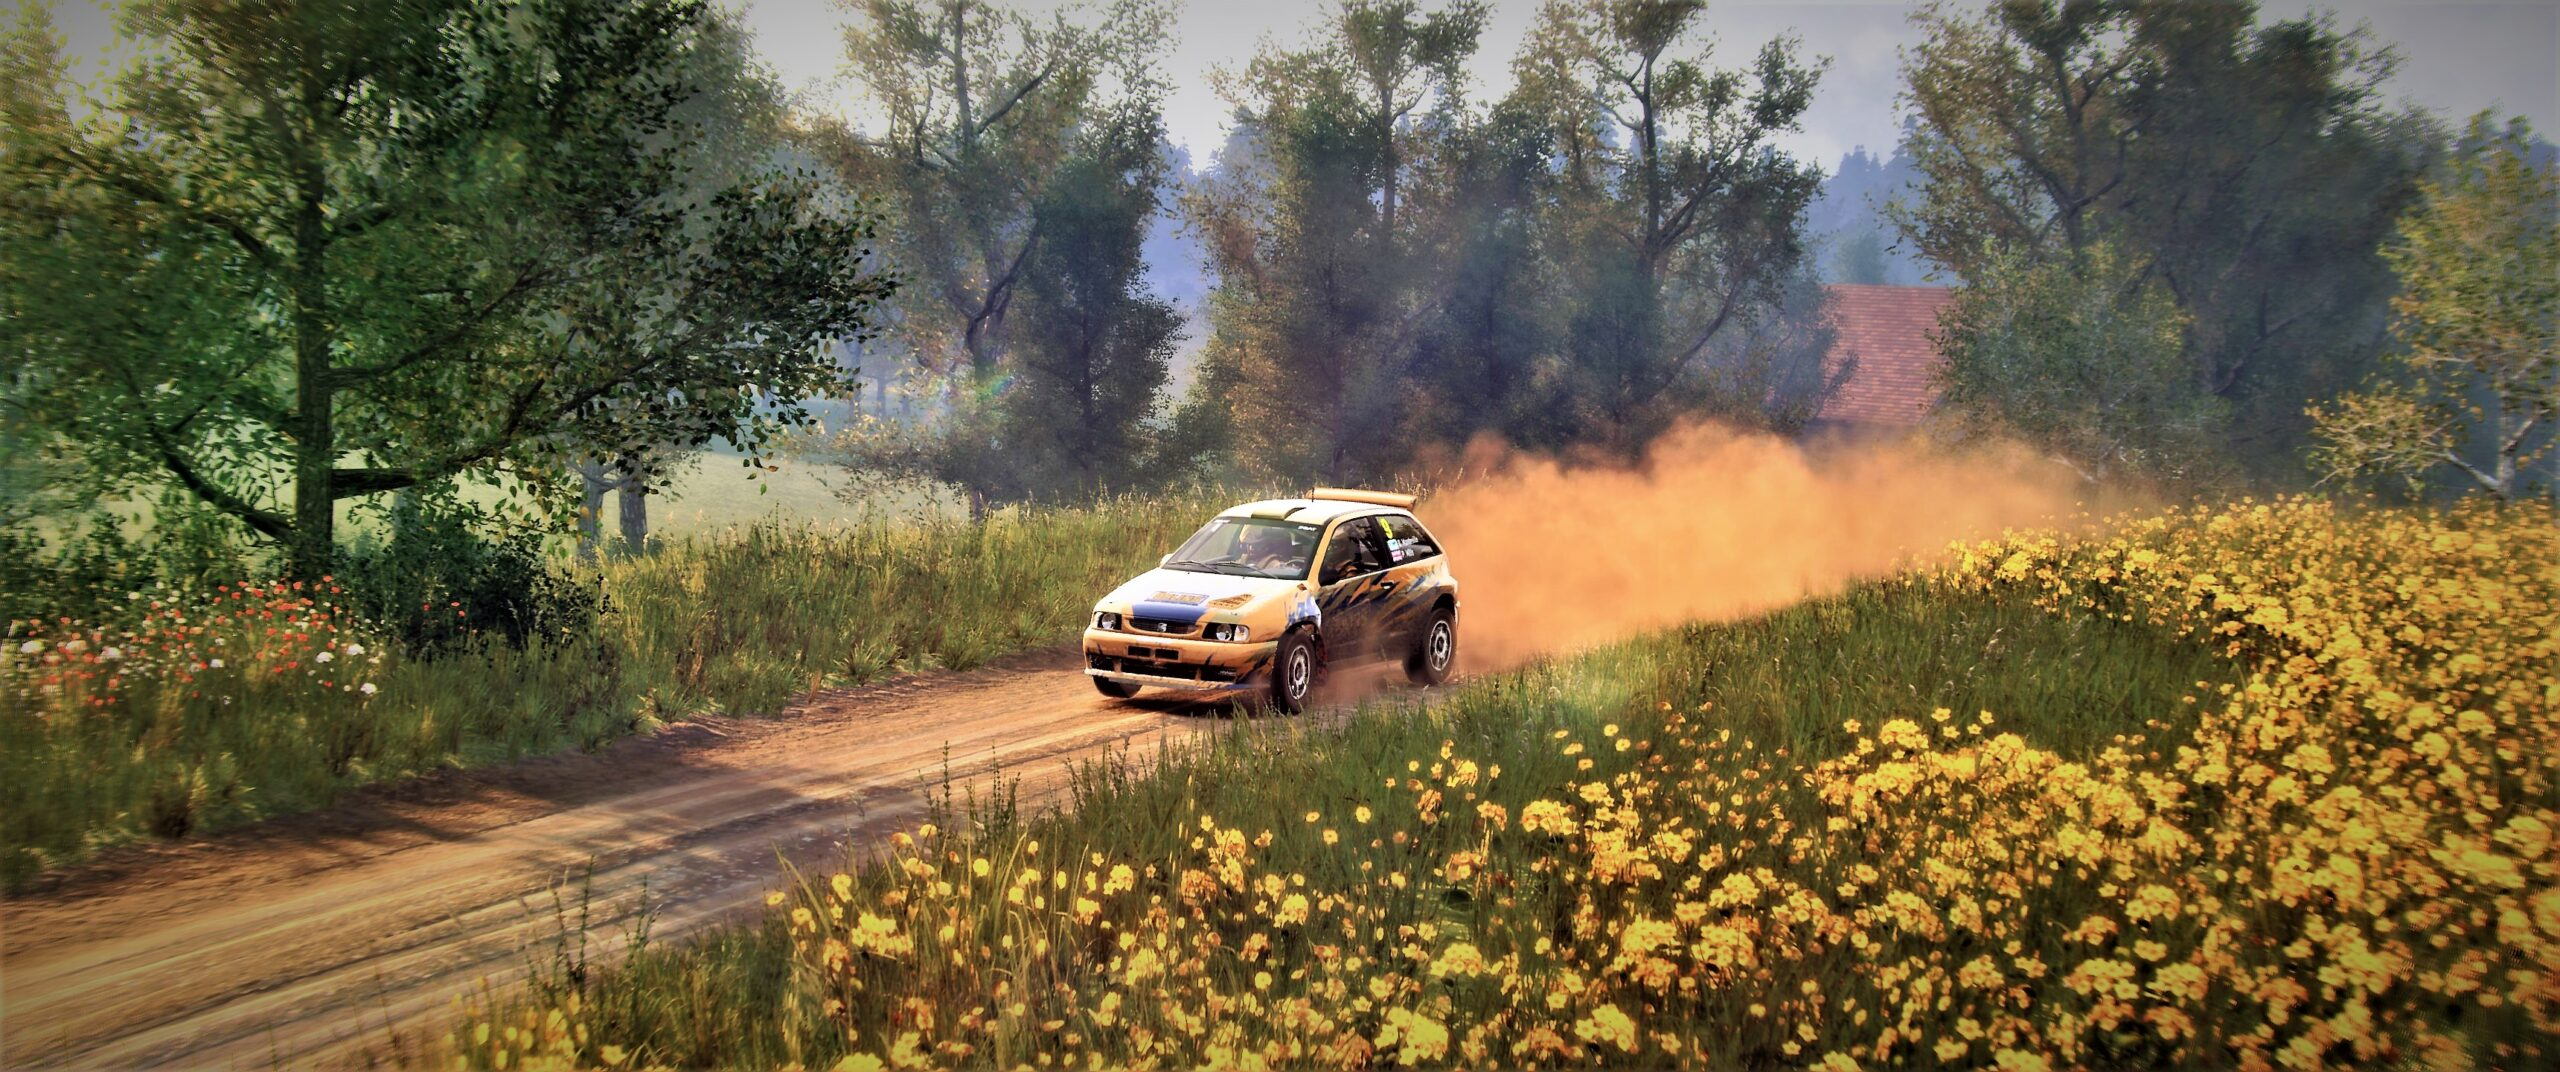 Carib Rally Club Championship – Round 1 – Poland – Results